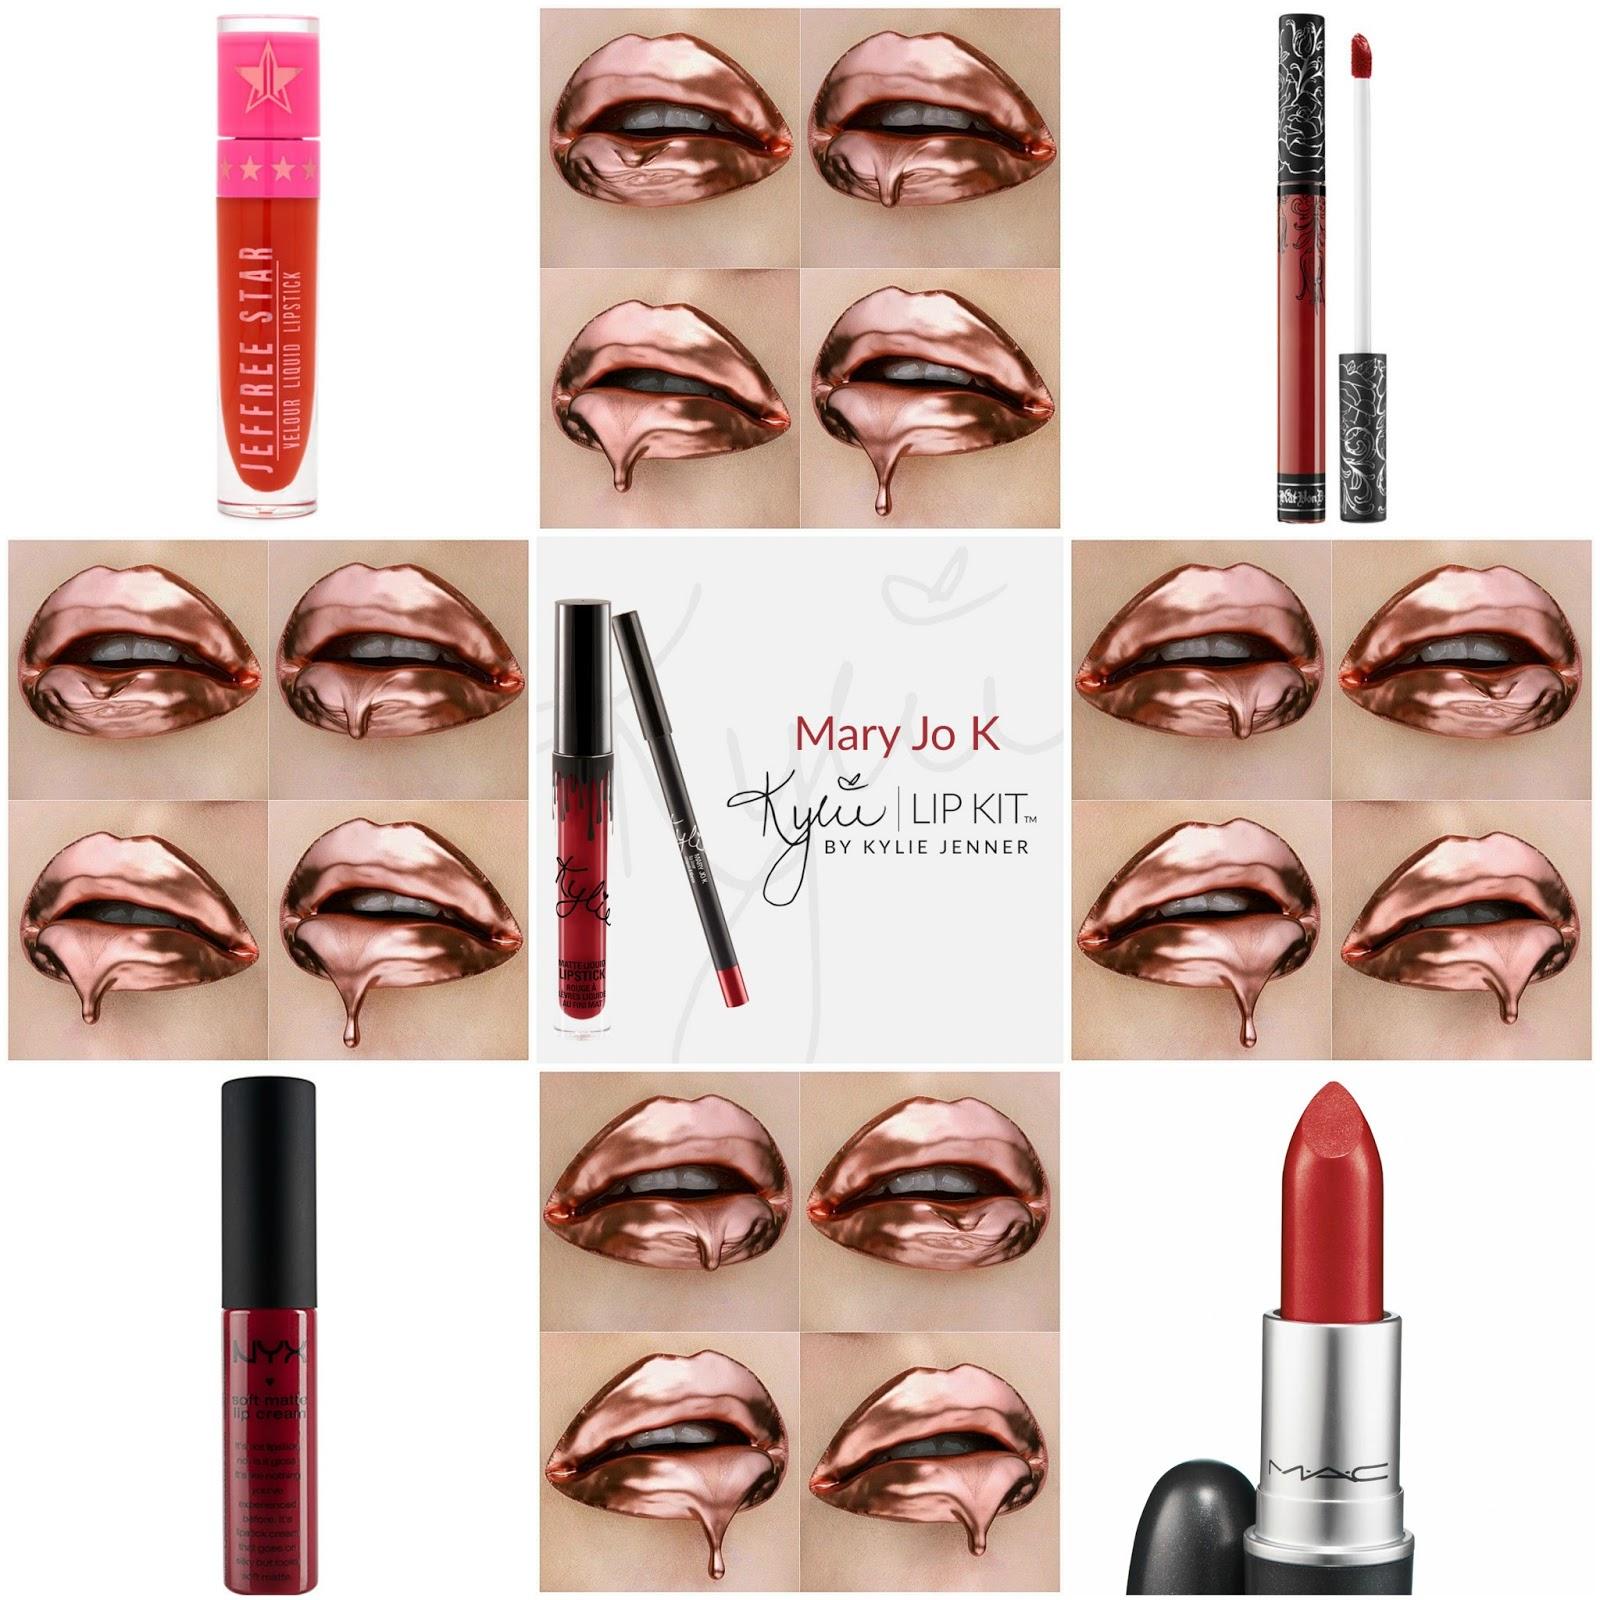 Lovejade Highend Drugstore Kylie Jenner Lip Kit Dupes Matte Liquid Marry Jo Jeffree Star Lipstick Redrum